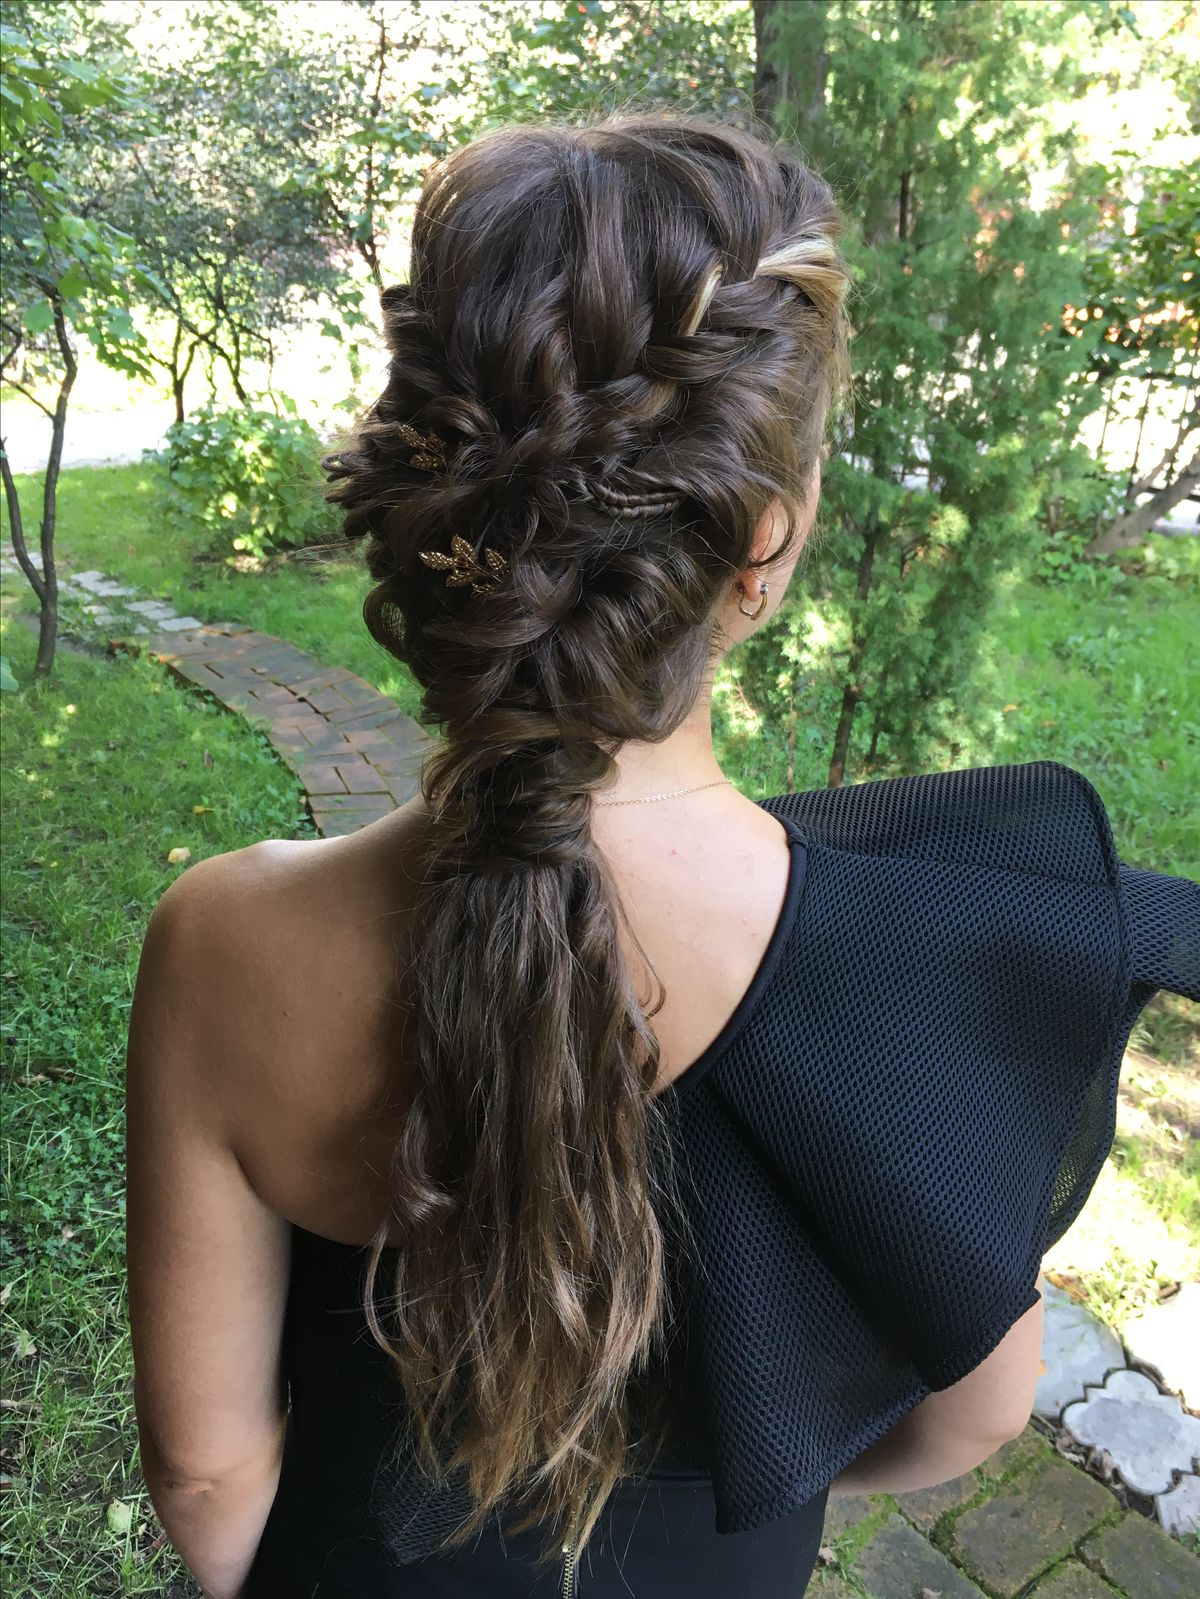 Hair Inspiration 2019-06-27 17:51:49